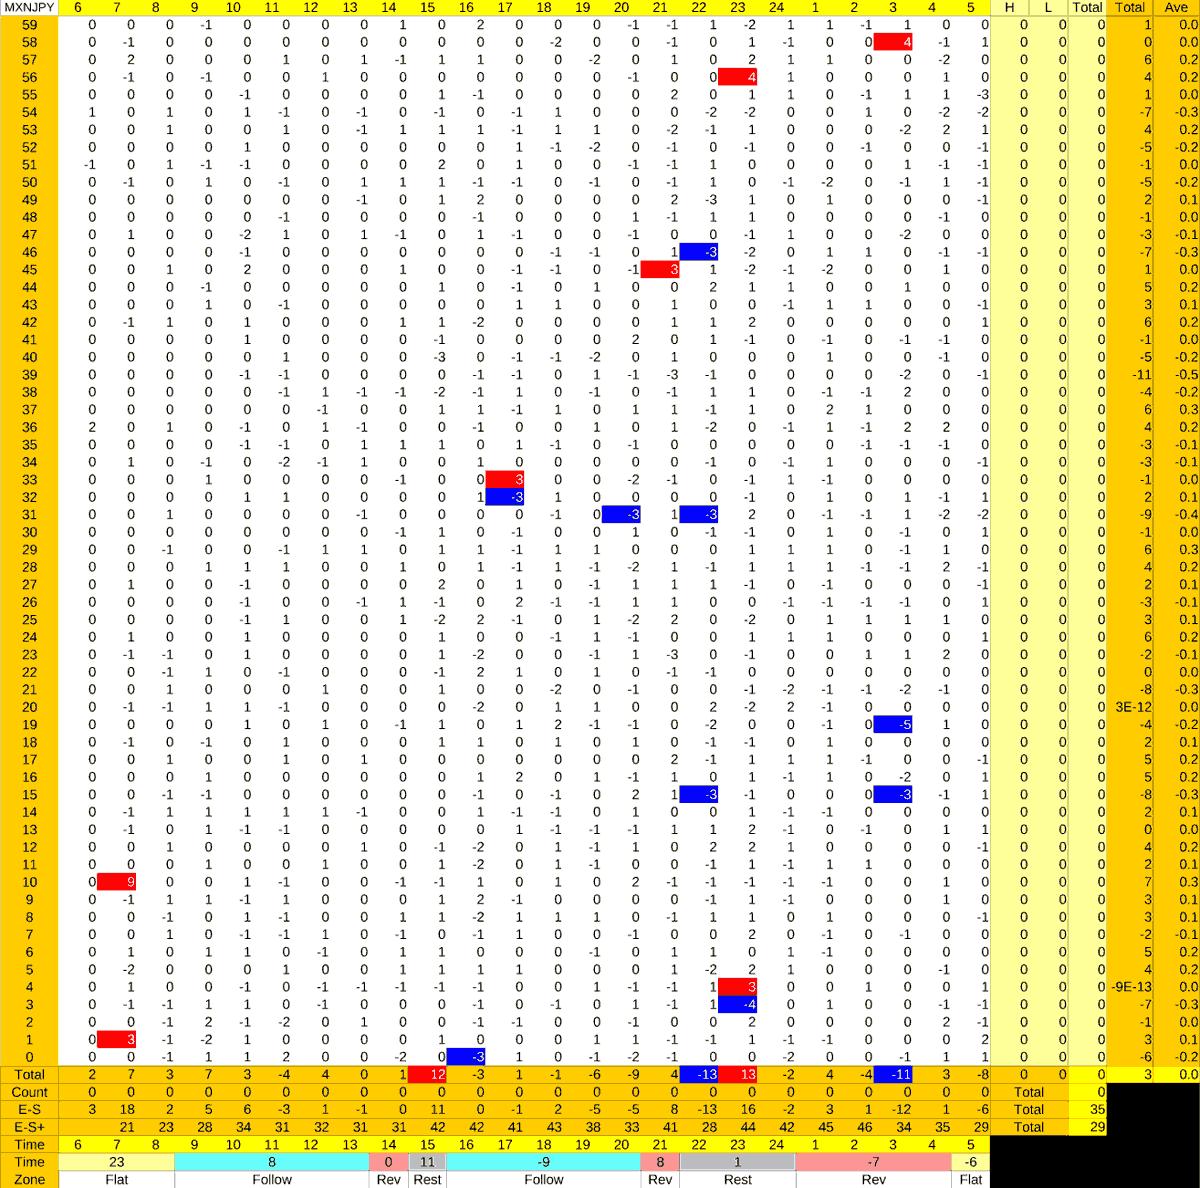 20210510_HS(3)MXNJPY